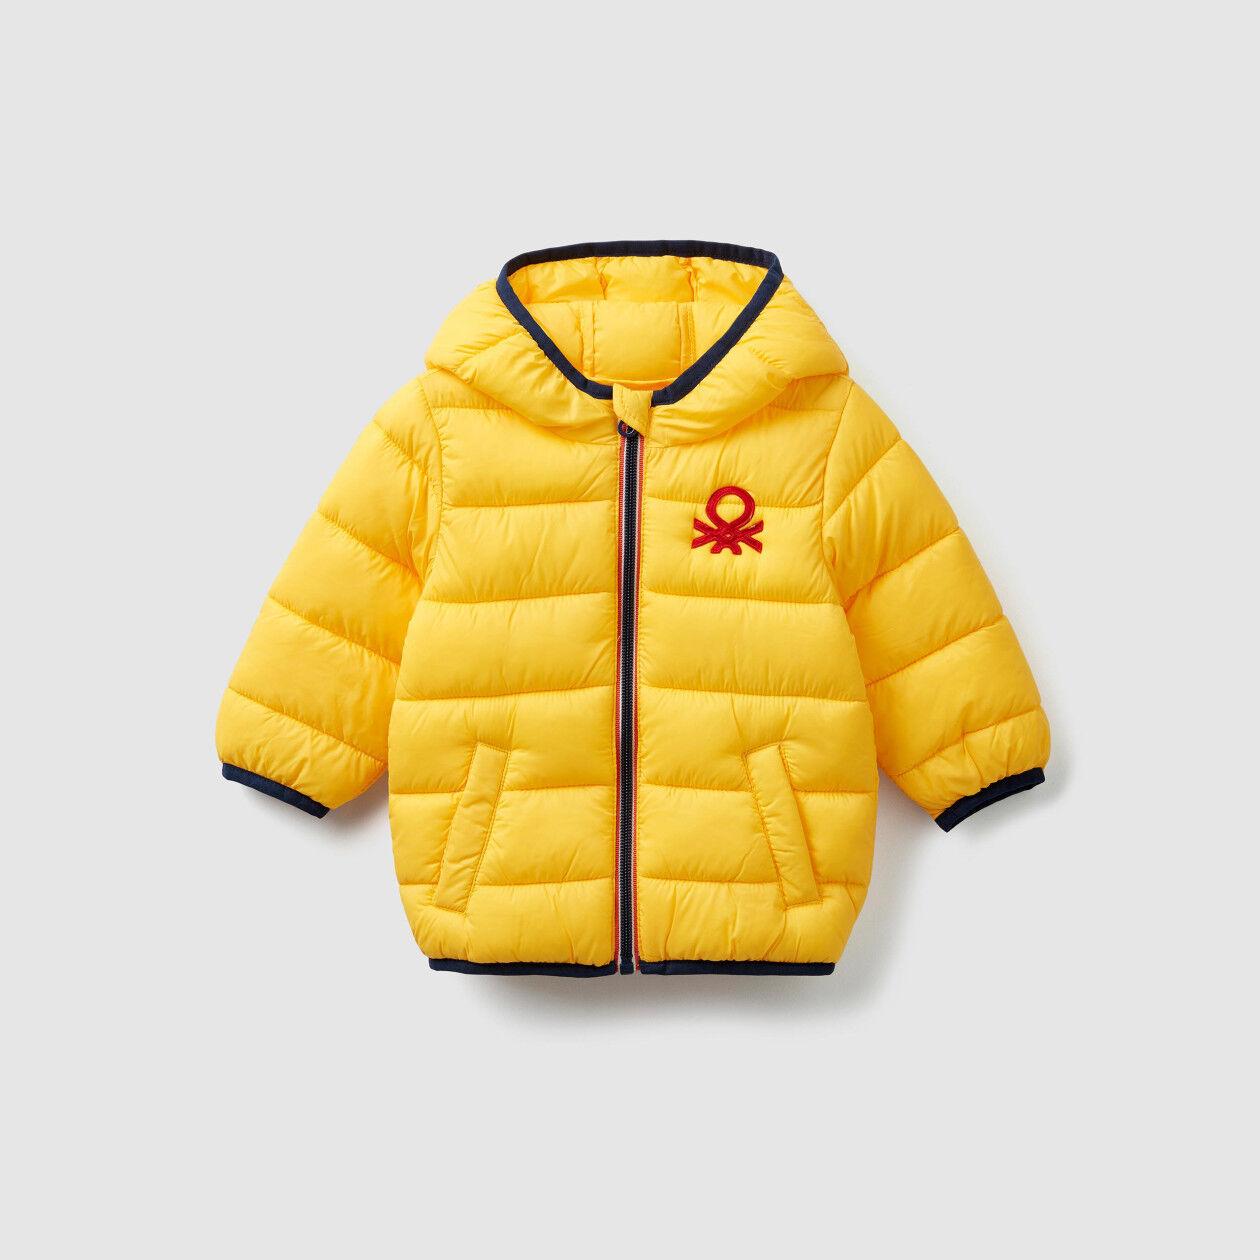 """Rain defender"" jacket"